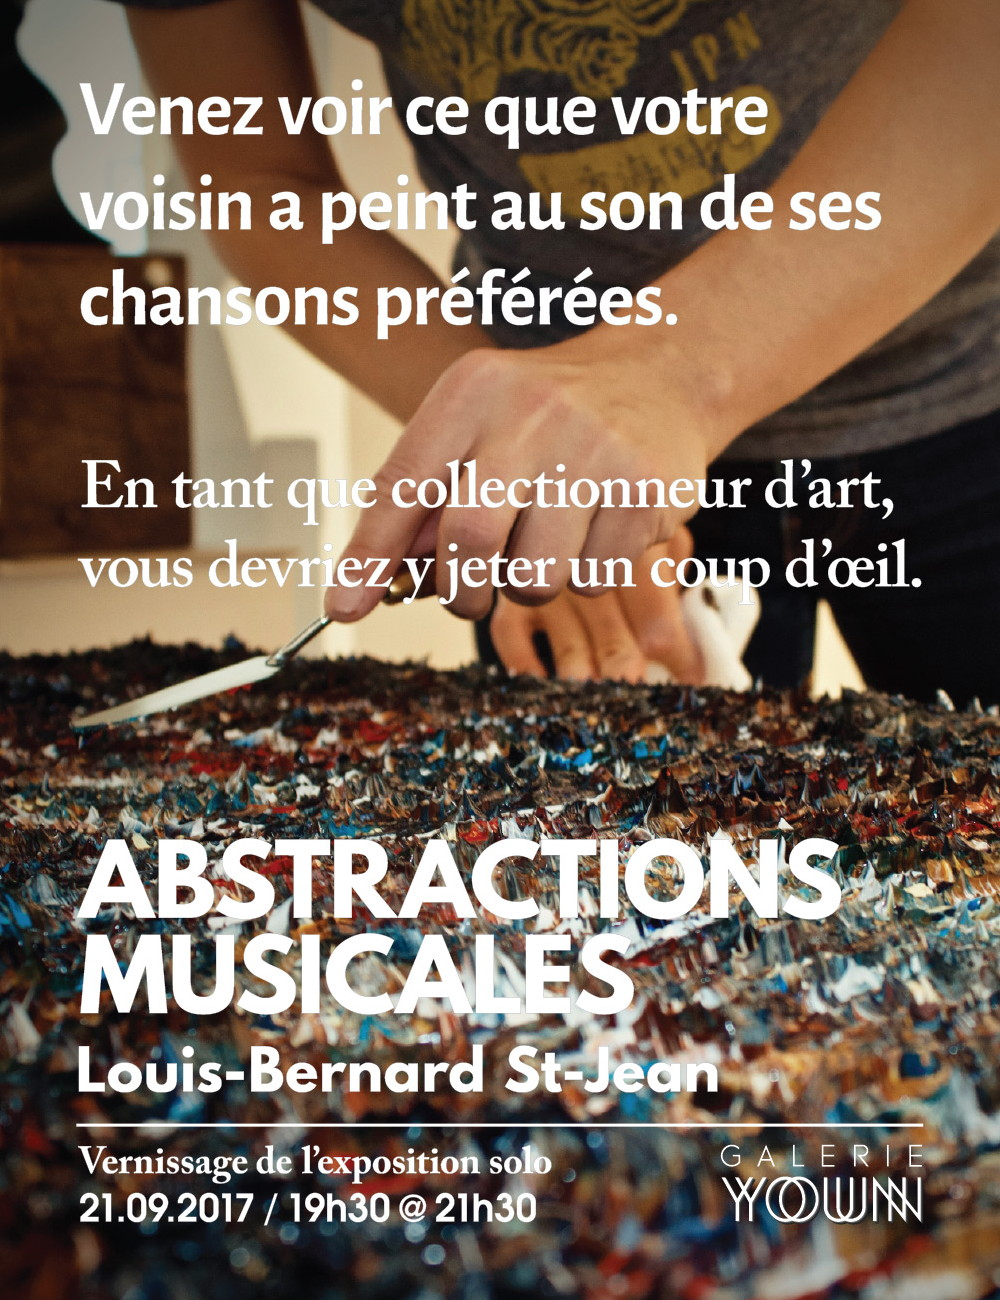 Affiche de l'exposition  Abstractions musicales